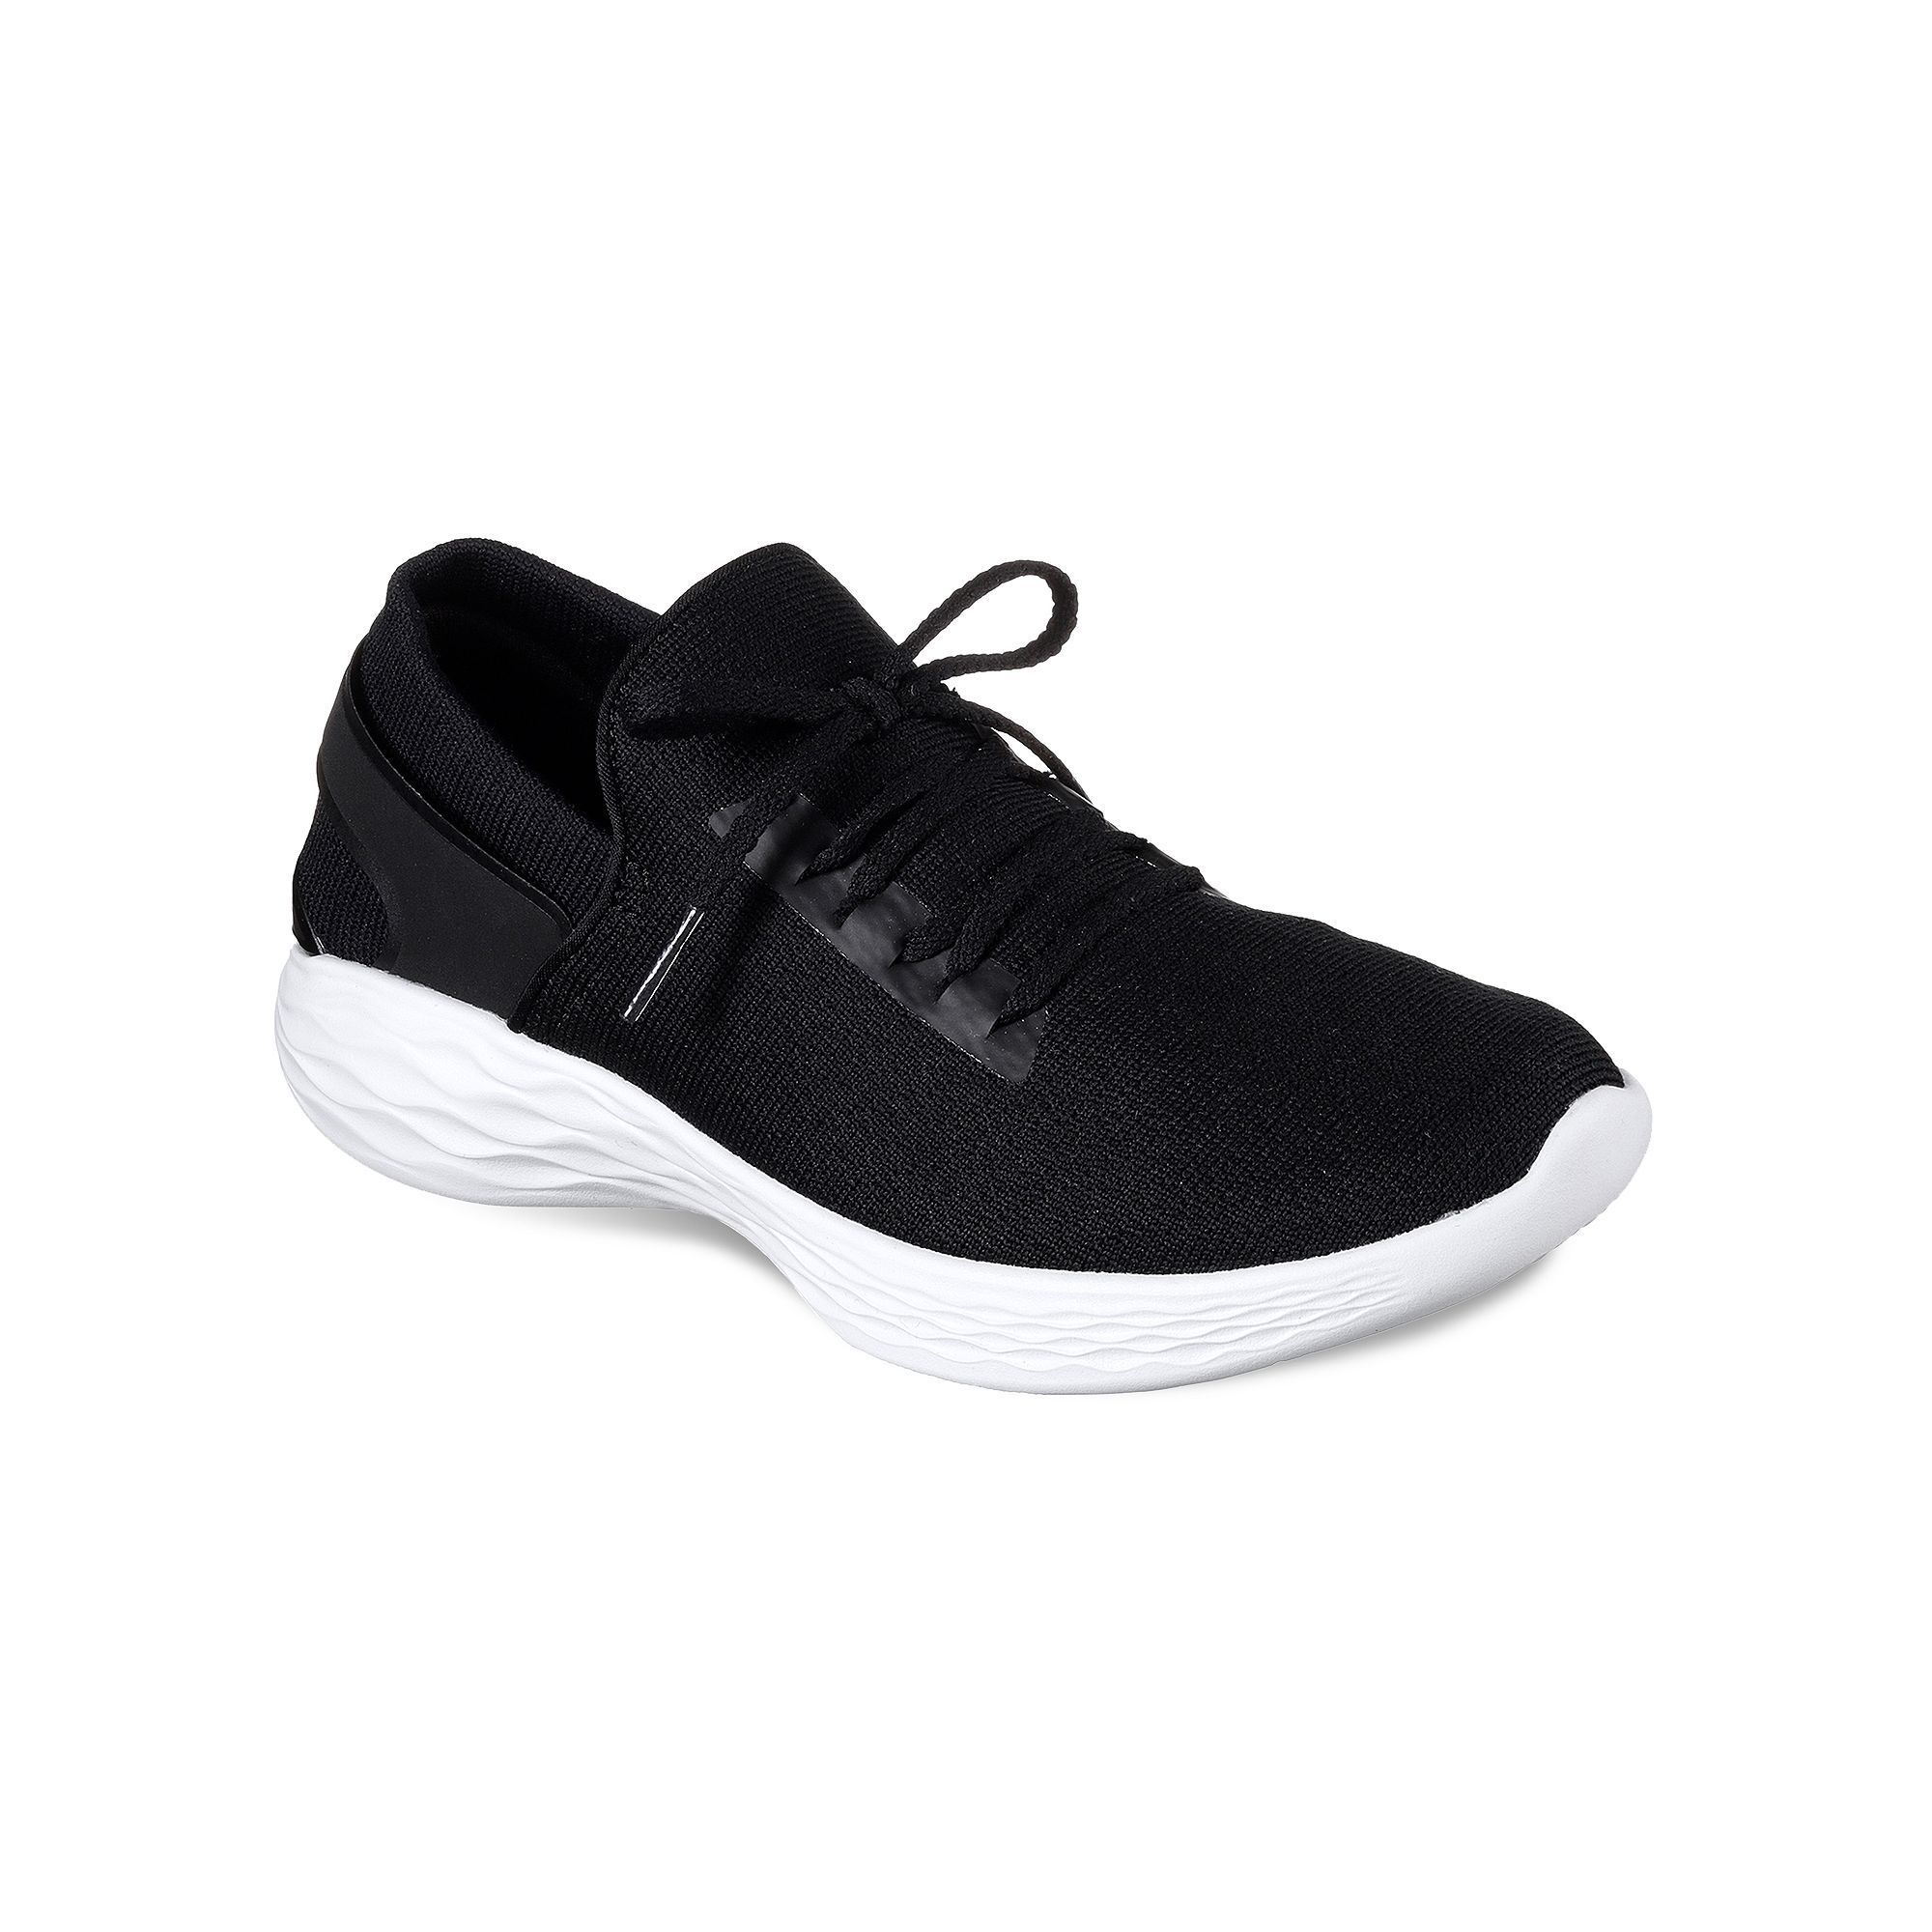 Choose Size Grey Skechers Women/'s YOU Inspire Slip-on Shoe Brand New!